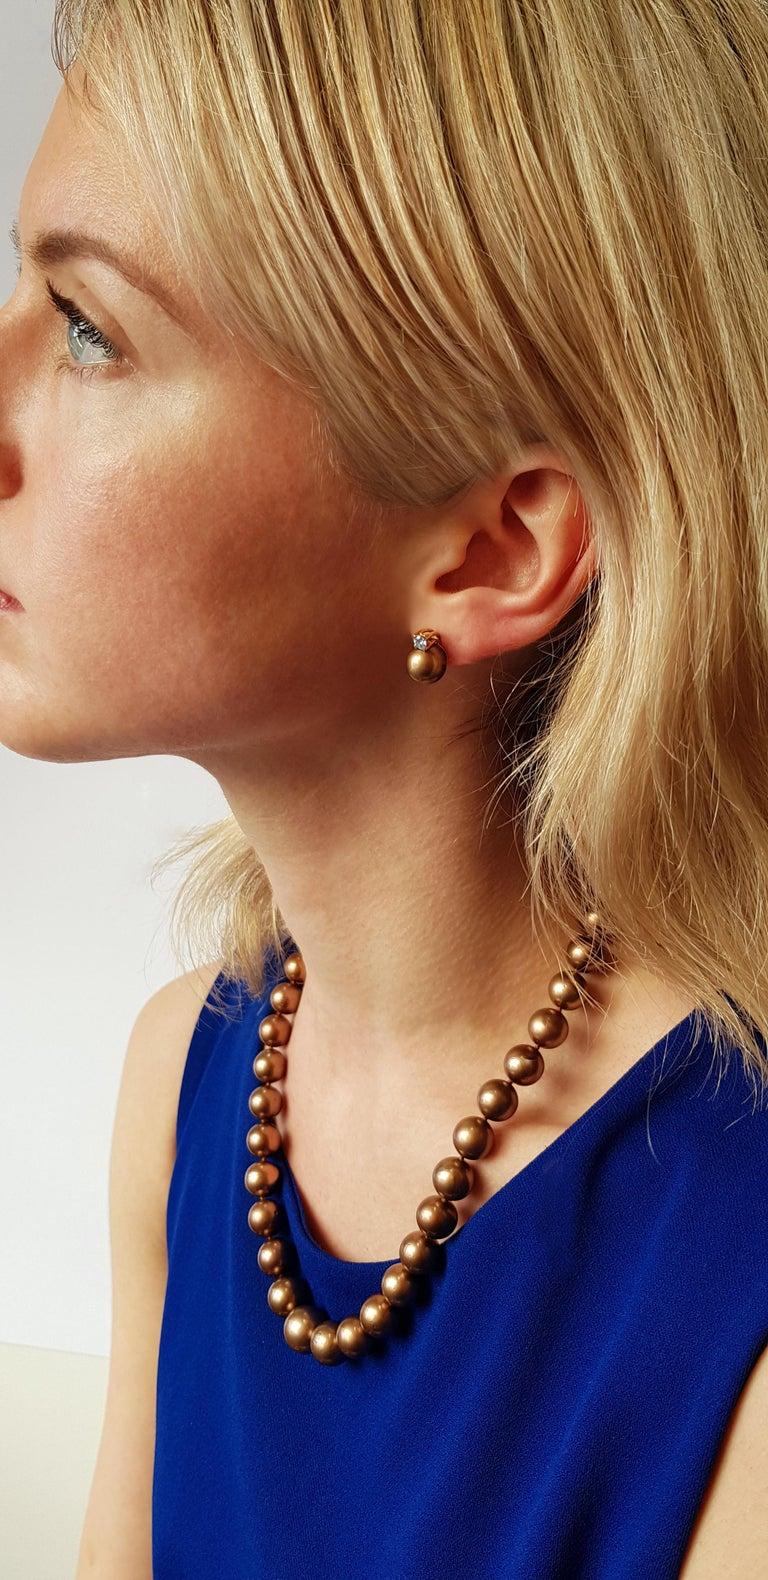 Round Cut Yoko London Chocolate Tahitian Pearl and Diamond Earrings Set in 18 Karat Gold For Sale